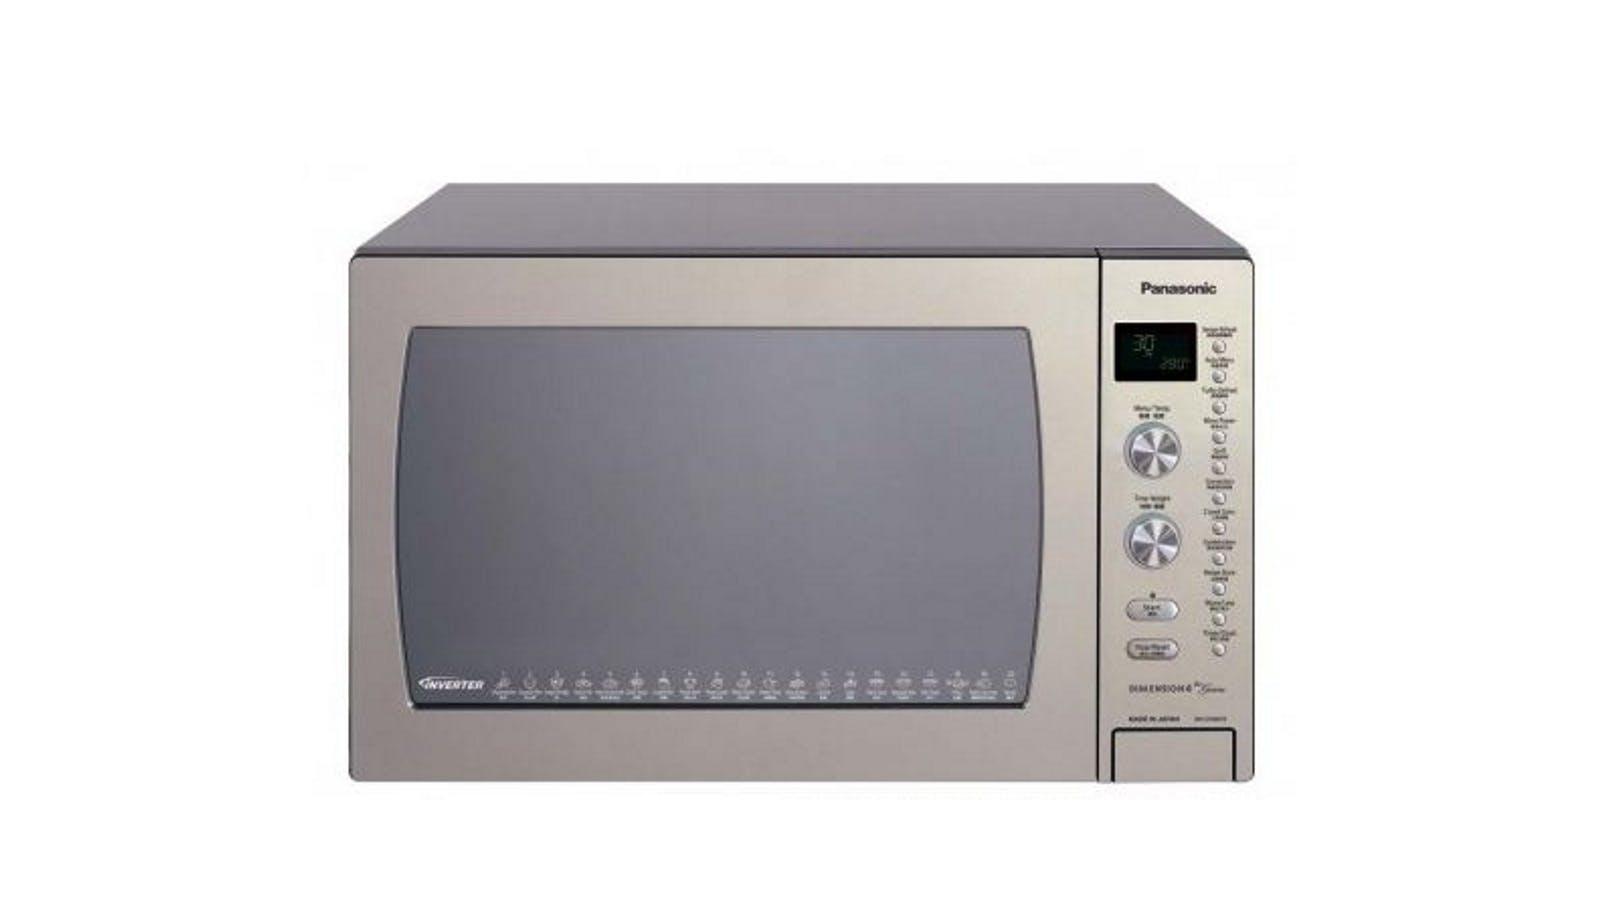 Panasonic Nn Cd997sypq Microwave Oven